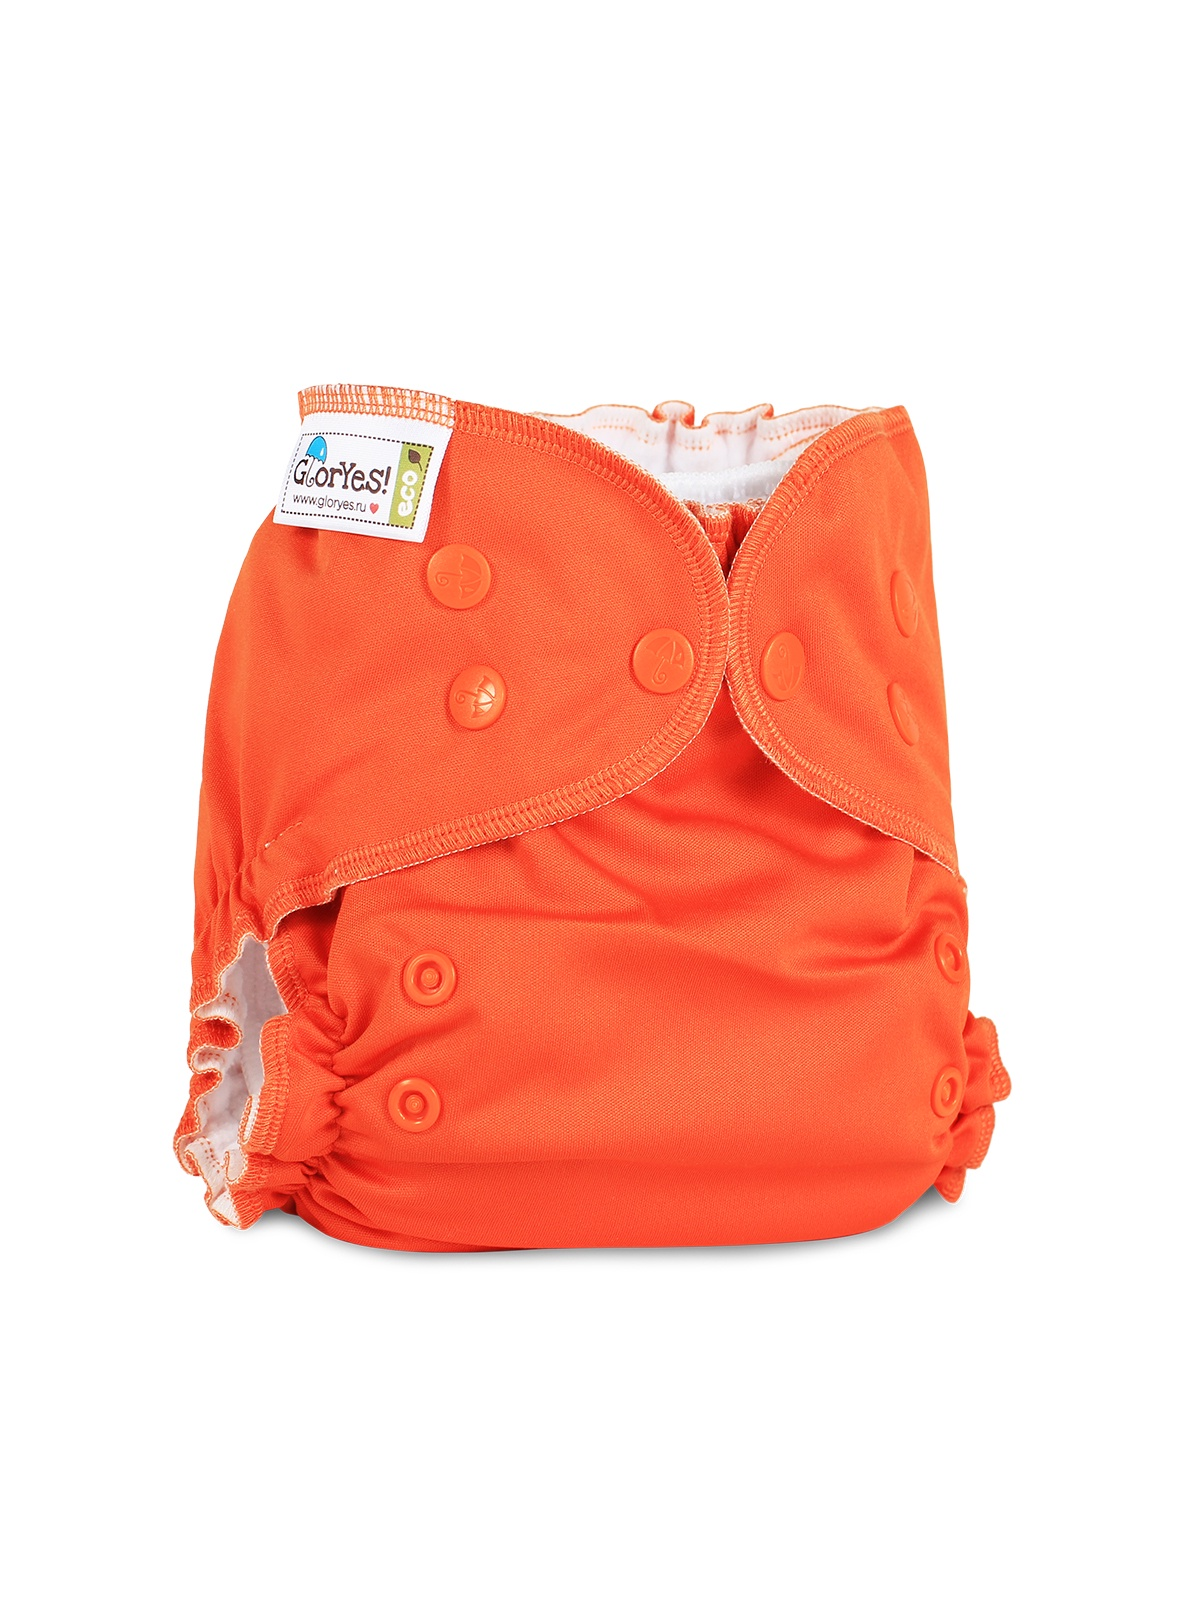 Фото - Многоразовый подгузник GlorYes! CLASSIC+ Апельсин глориес многоразовый подгузник классик сафари 3 18кг 2 вкладыша